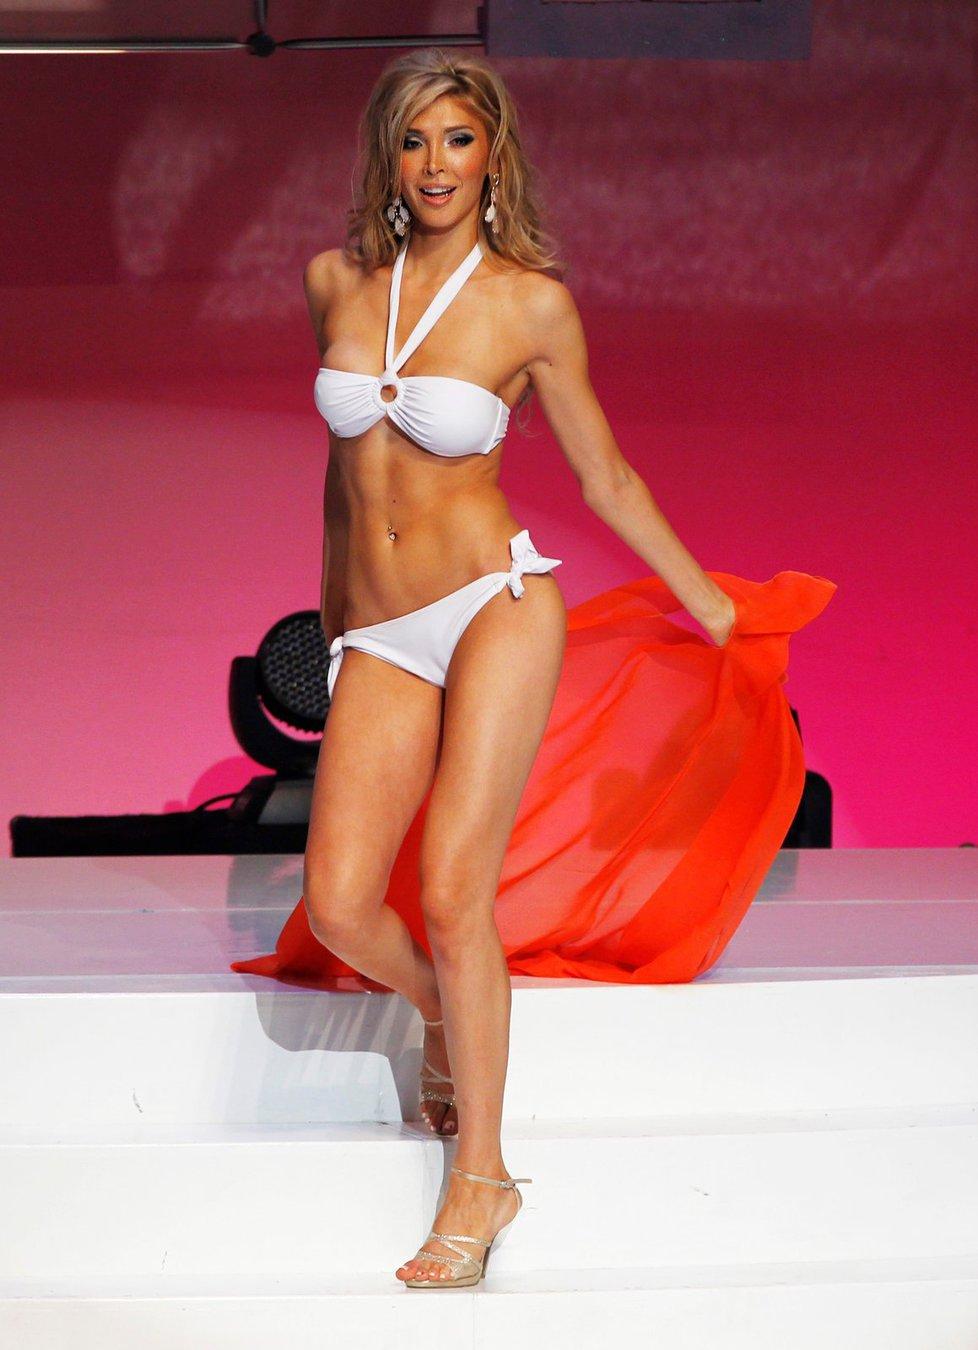 Jenna Talackova mamoplastia